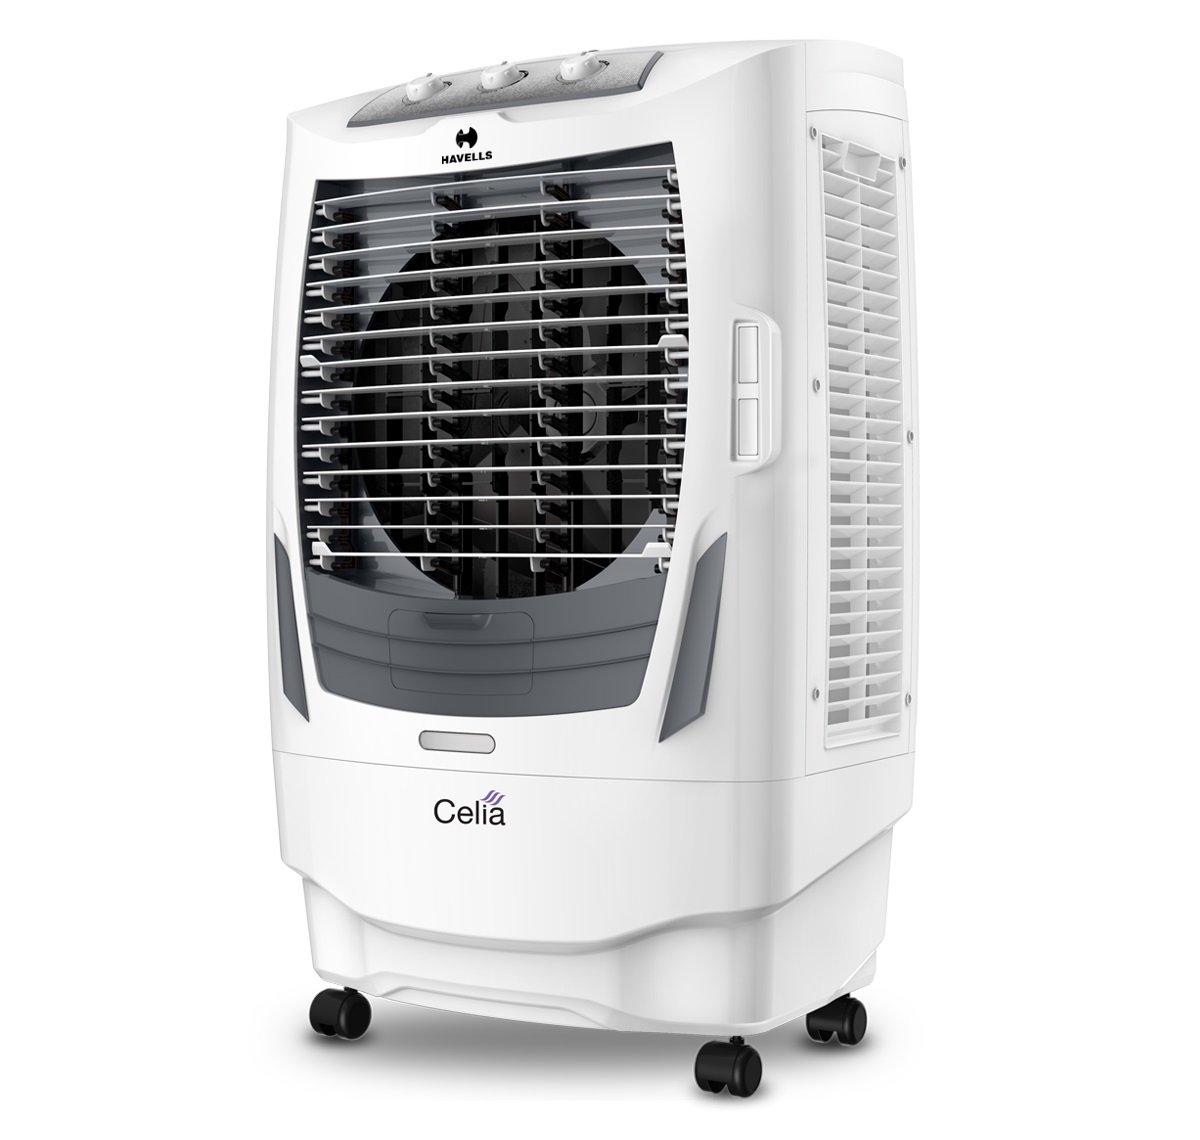 Havells Celia Desert Air Cooler 55 liters